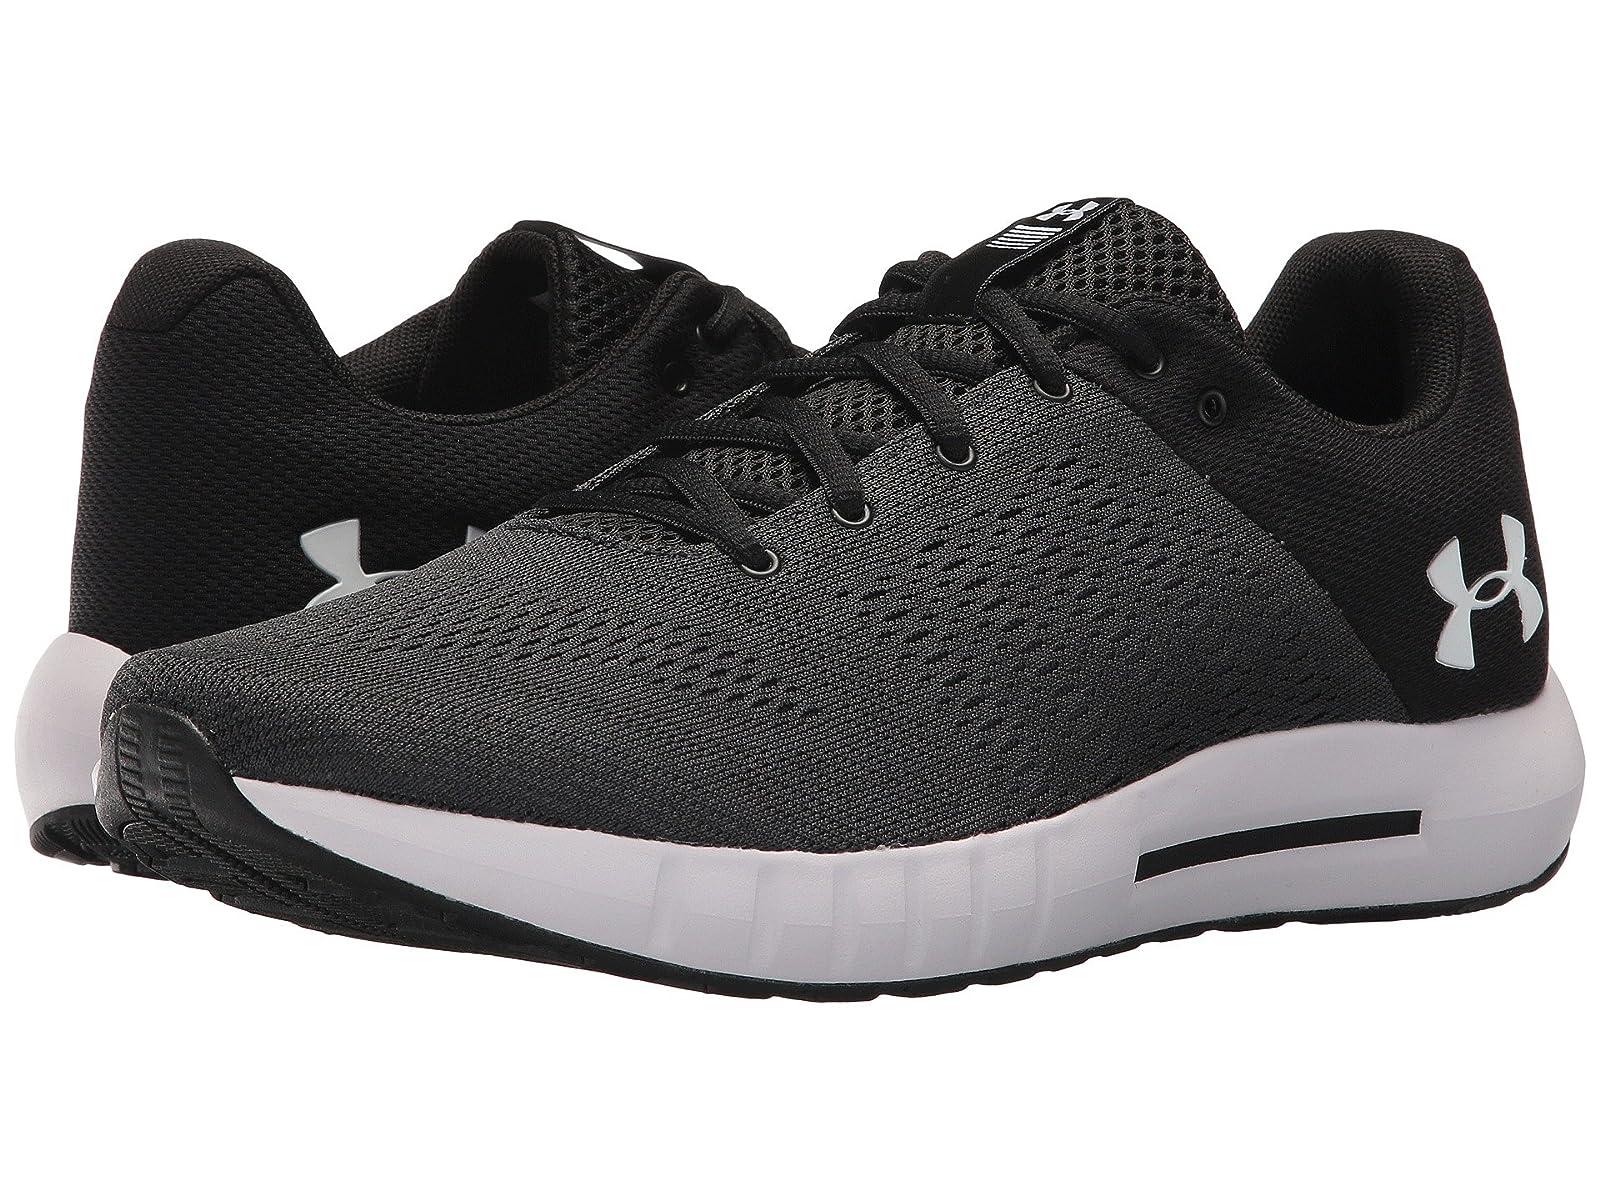 Under Armour UA Micro G PursuitAtmospheric grades have affordable shoes